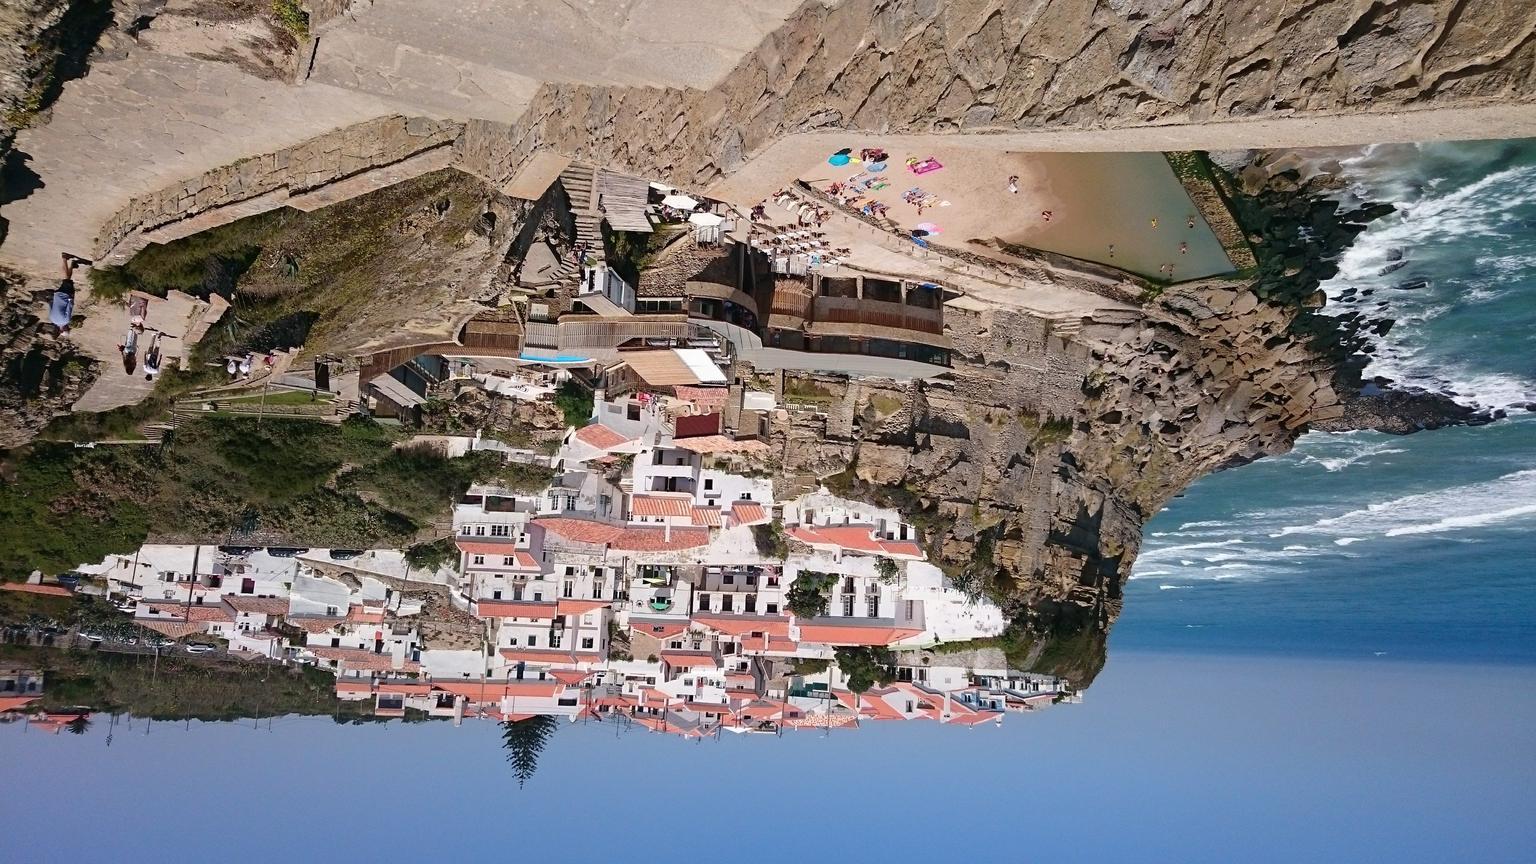 MÁS FOTOS, Excursión para grupos pequeños a Sintra y Cascais desde Lisboa